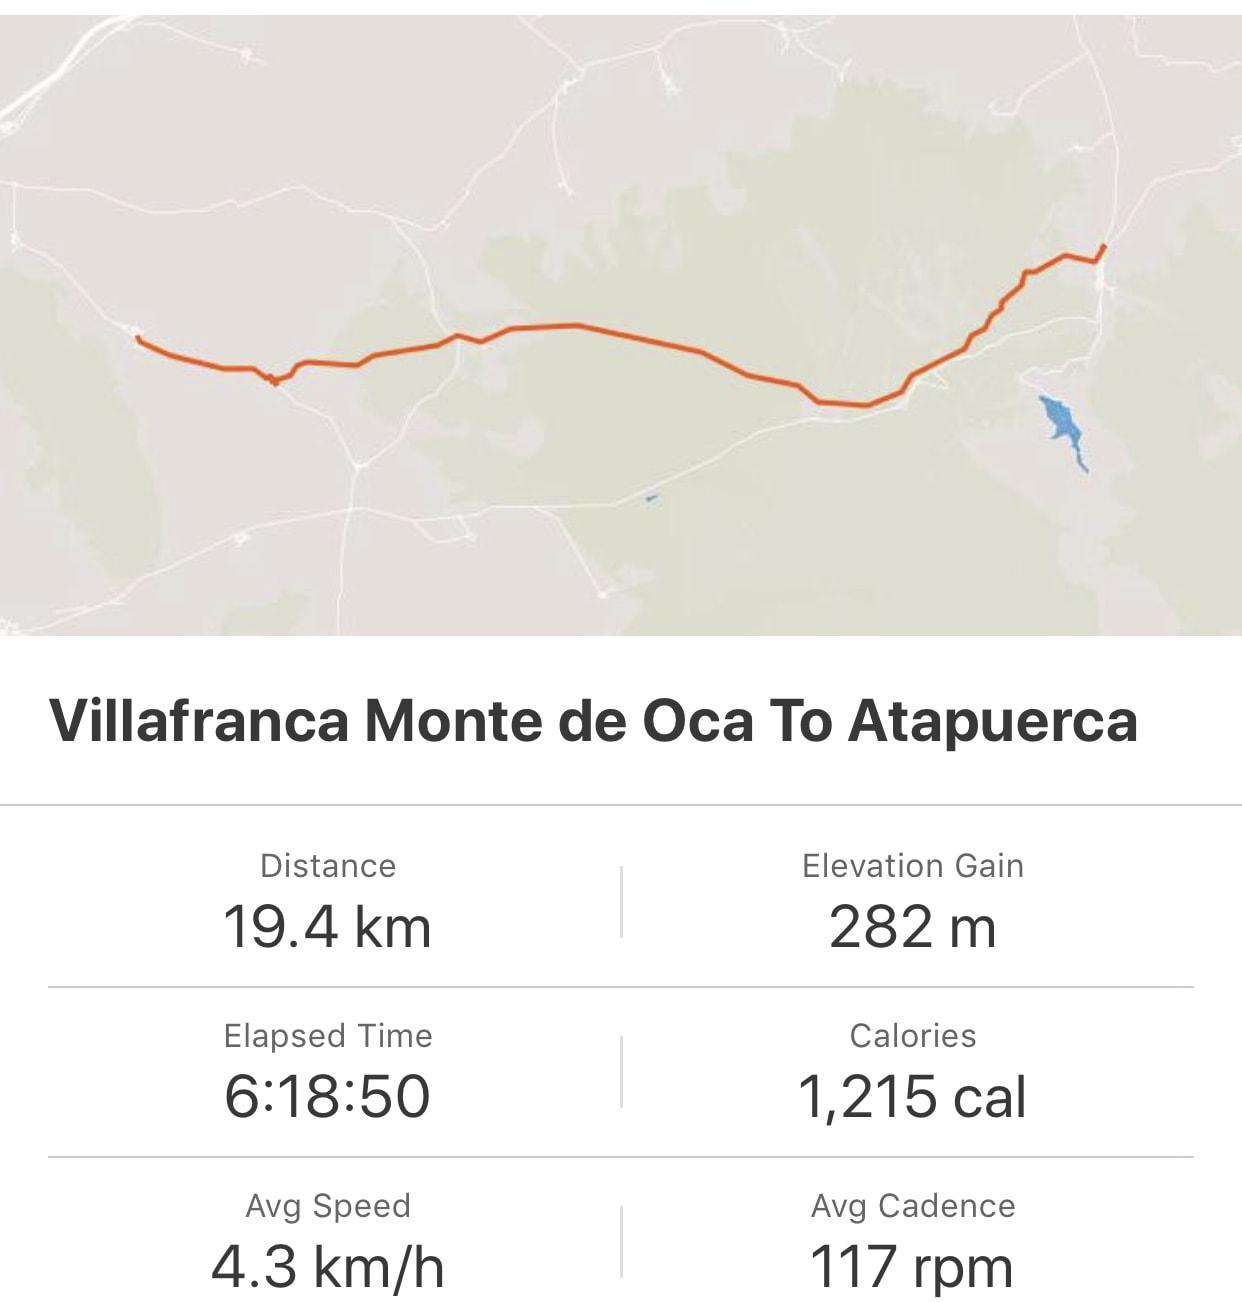 Strava: Villafranca Monte de Oca to Atapuerca